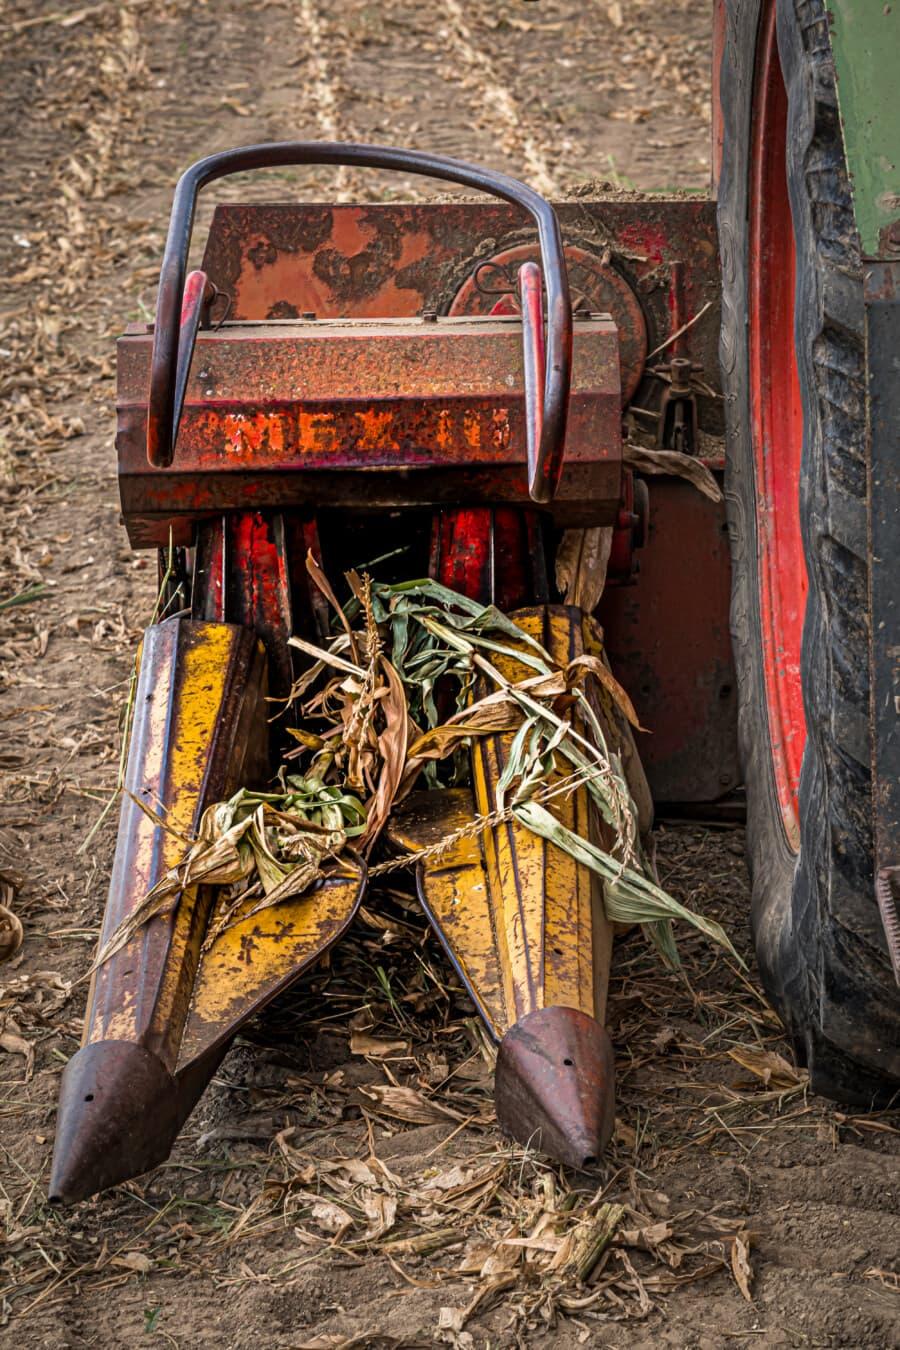 Harvest, Traktor, Harvester, Kornfeld, Mais, Reifen, industrielle, Landwirtschaft, Maschine, Maschinen